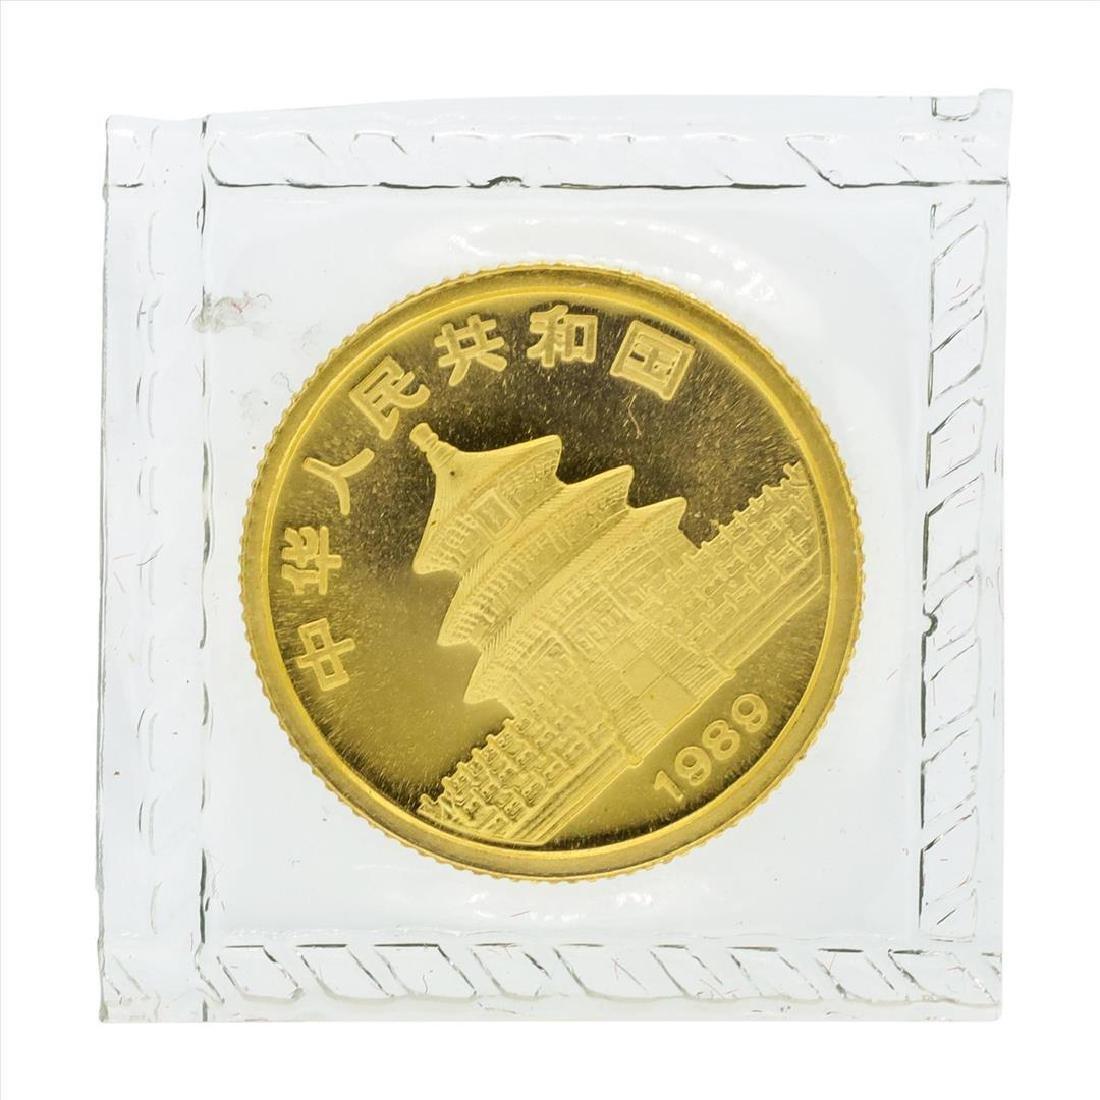 1989 10 Yuan China Panda 1/10 oz Gold Coin - 2